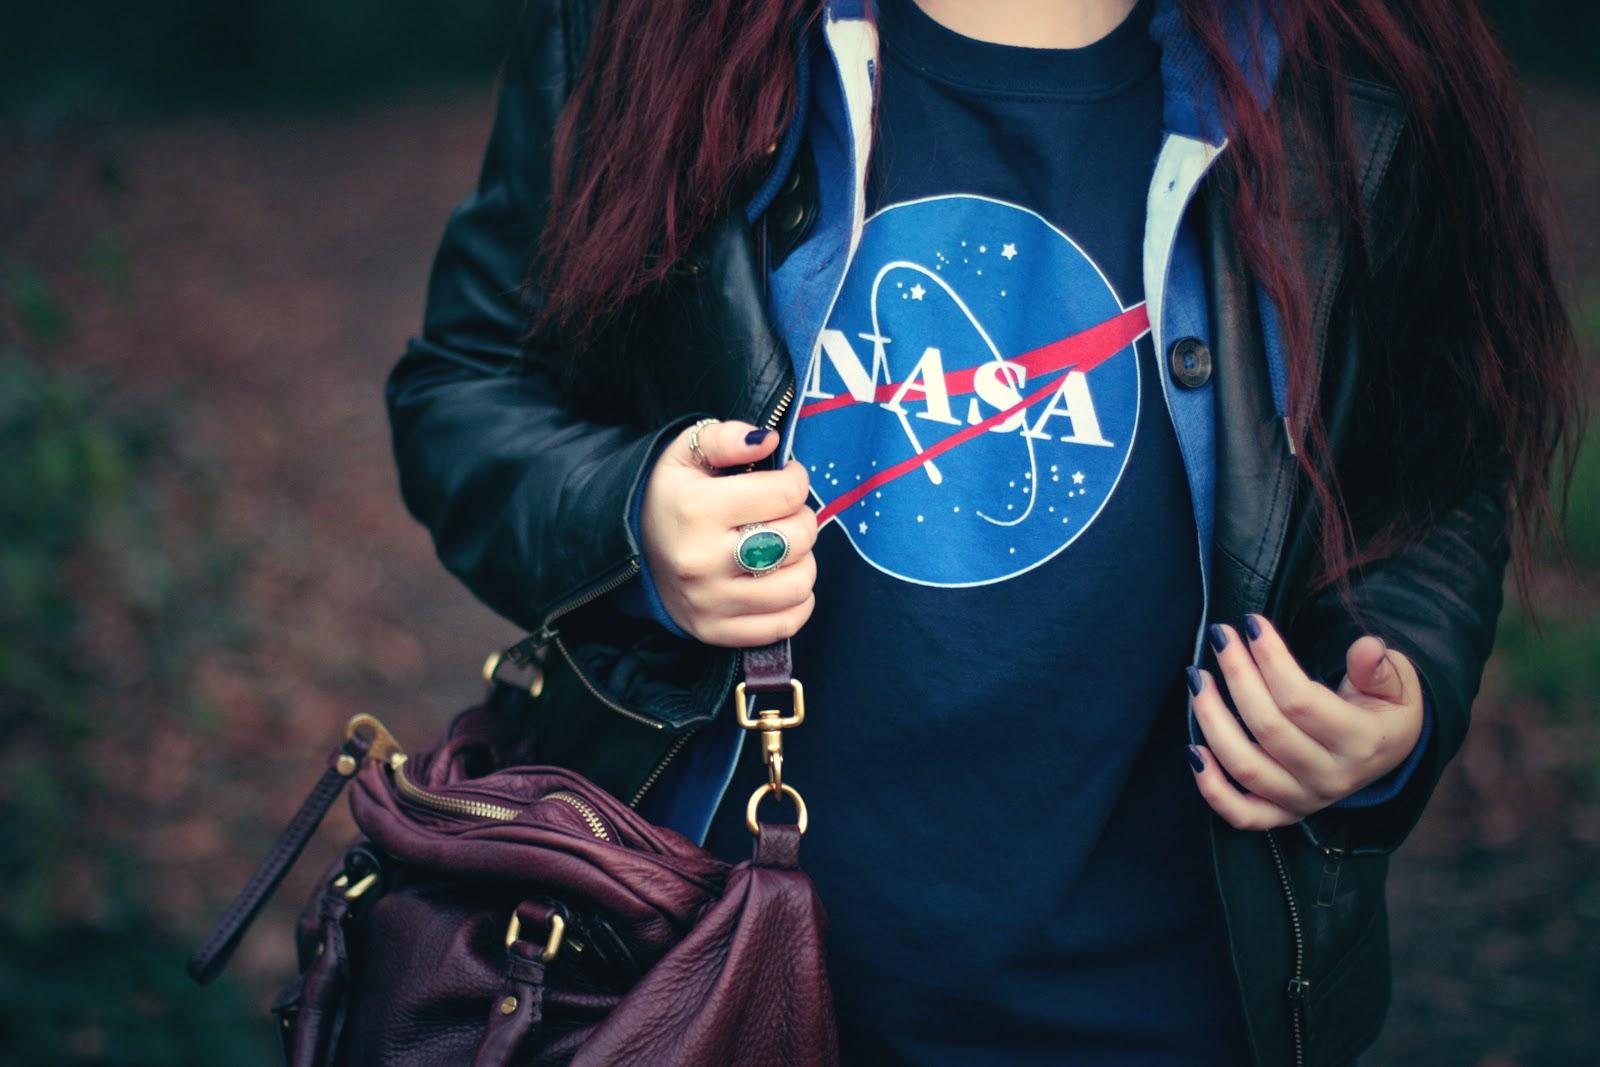 T Shirt NASA & Boots Caterpillar - Blog Mode